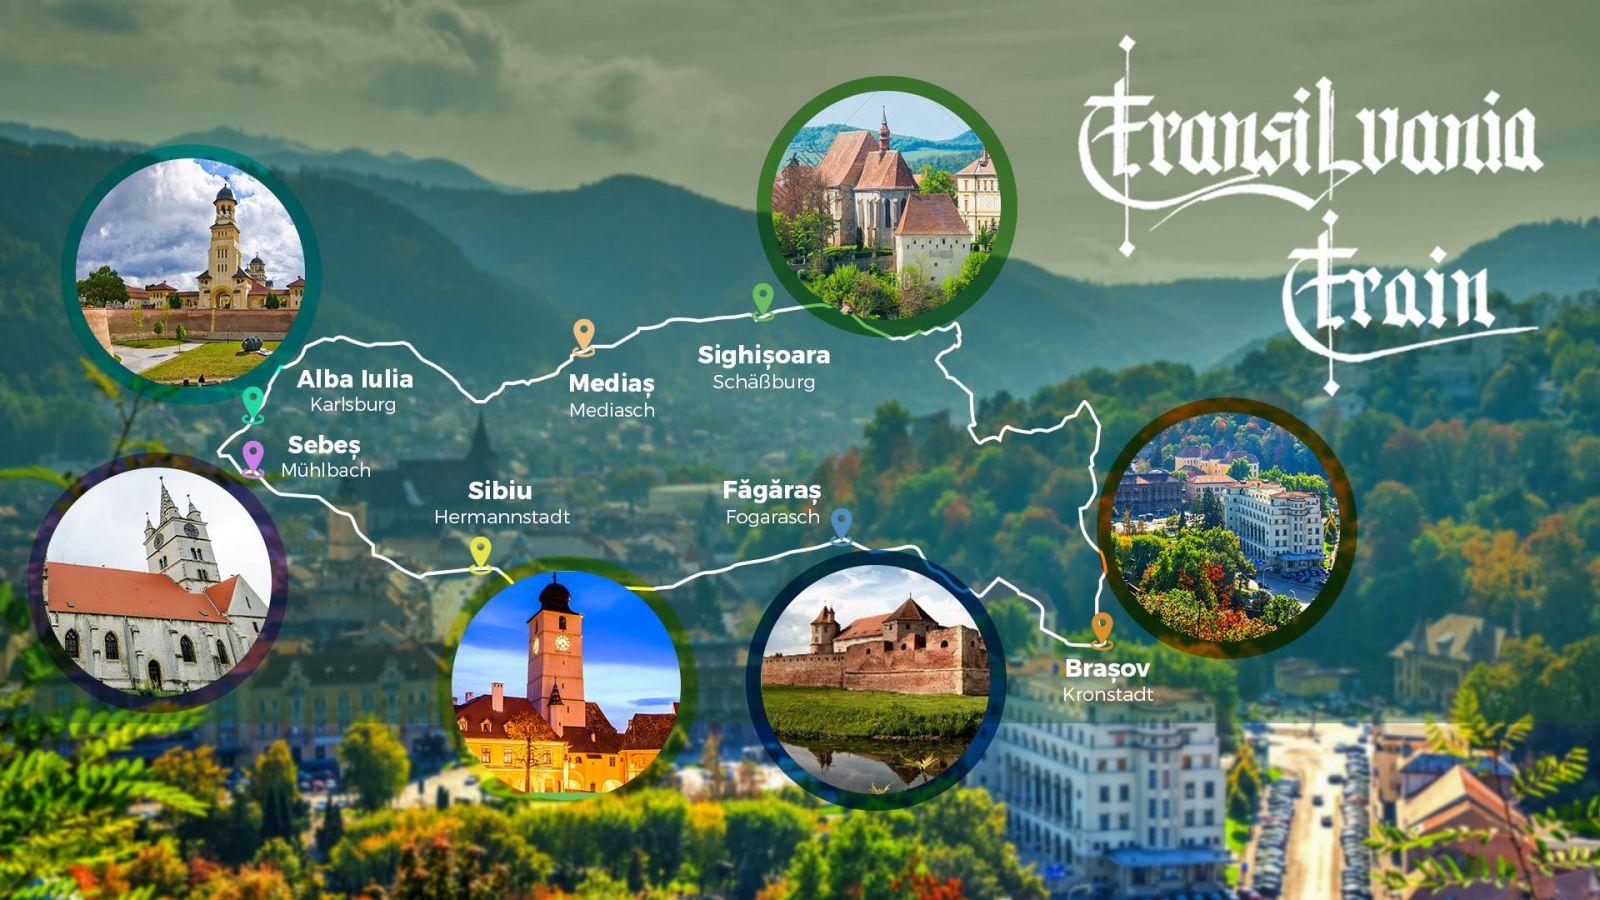 Fotó: transilvania-train.com